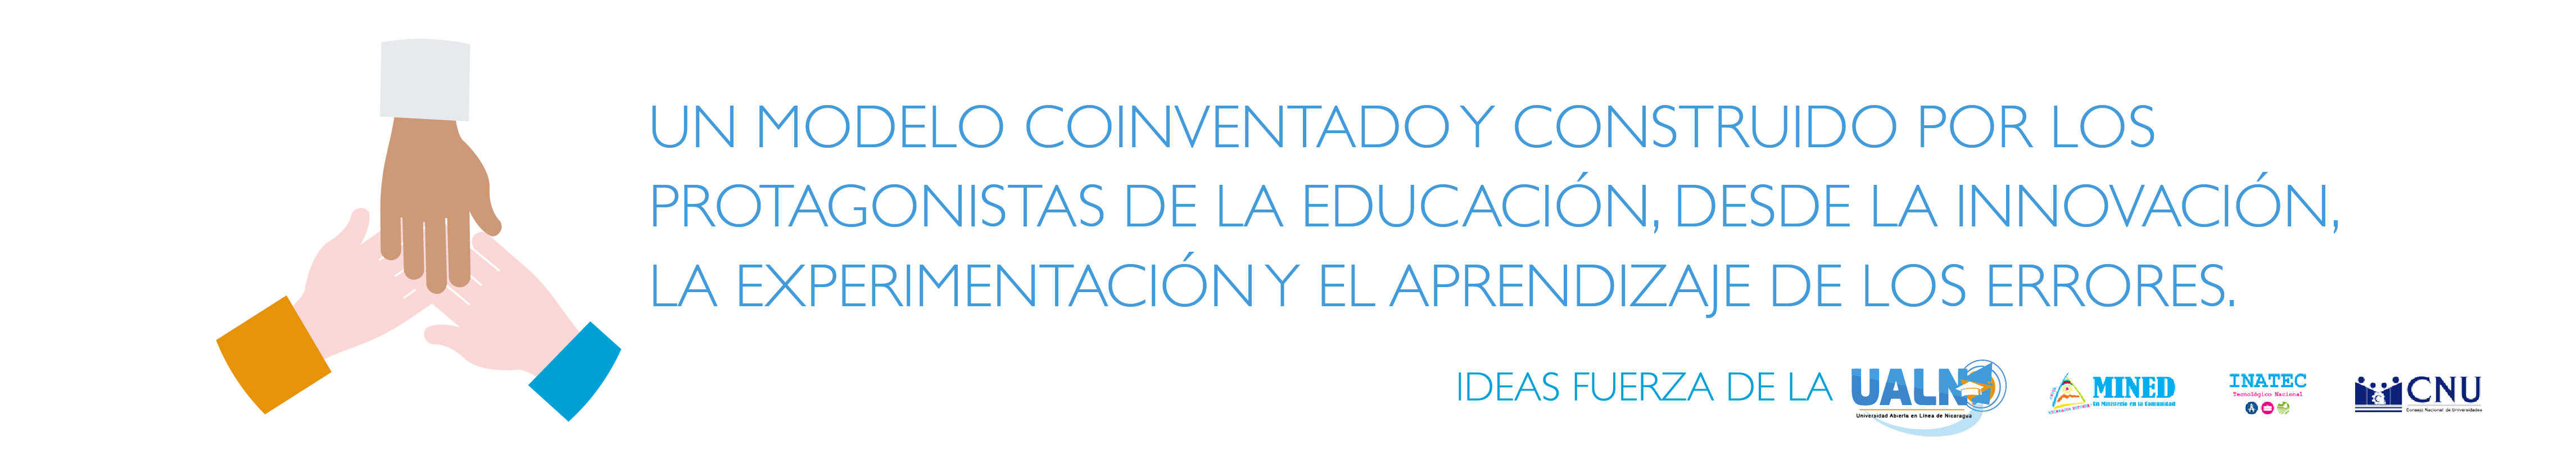 idea29-01